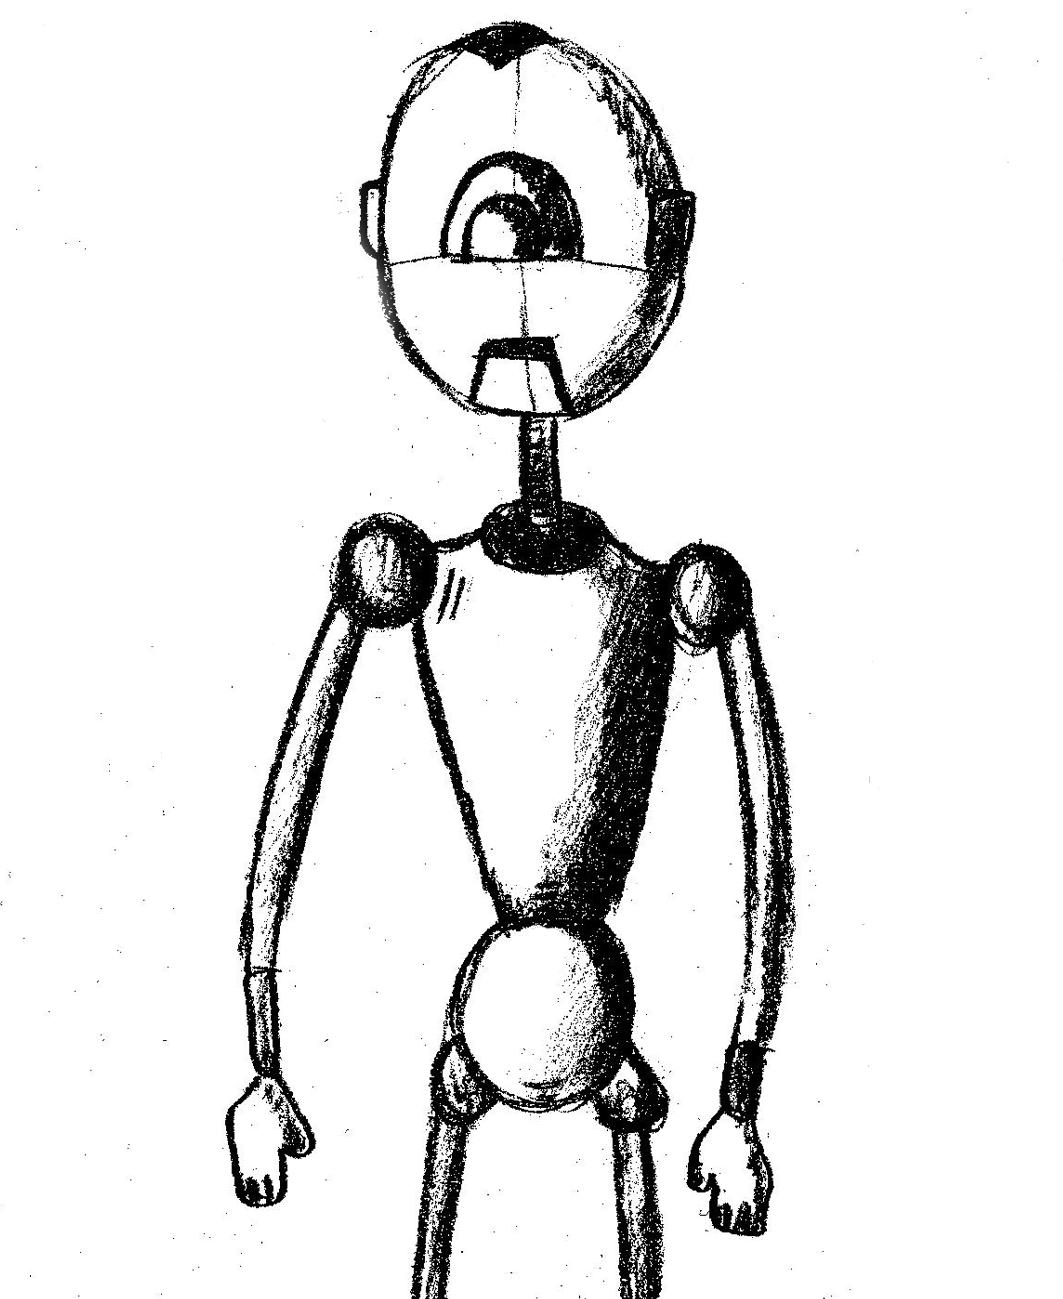 Robot sketch - Robot szkic by Exzhibit97